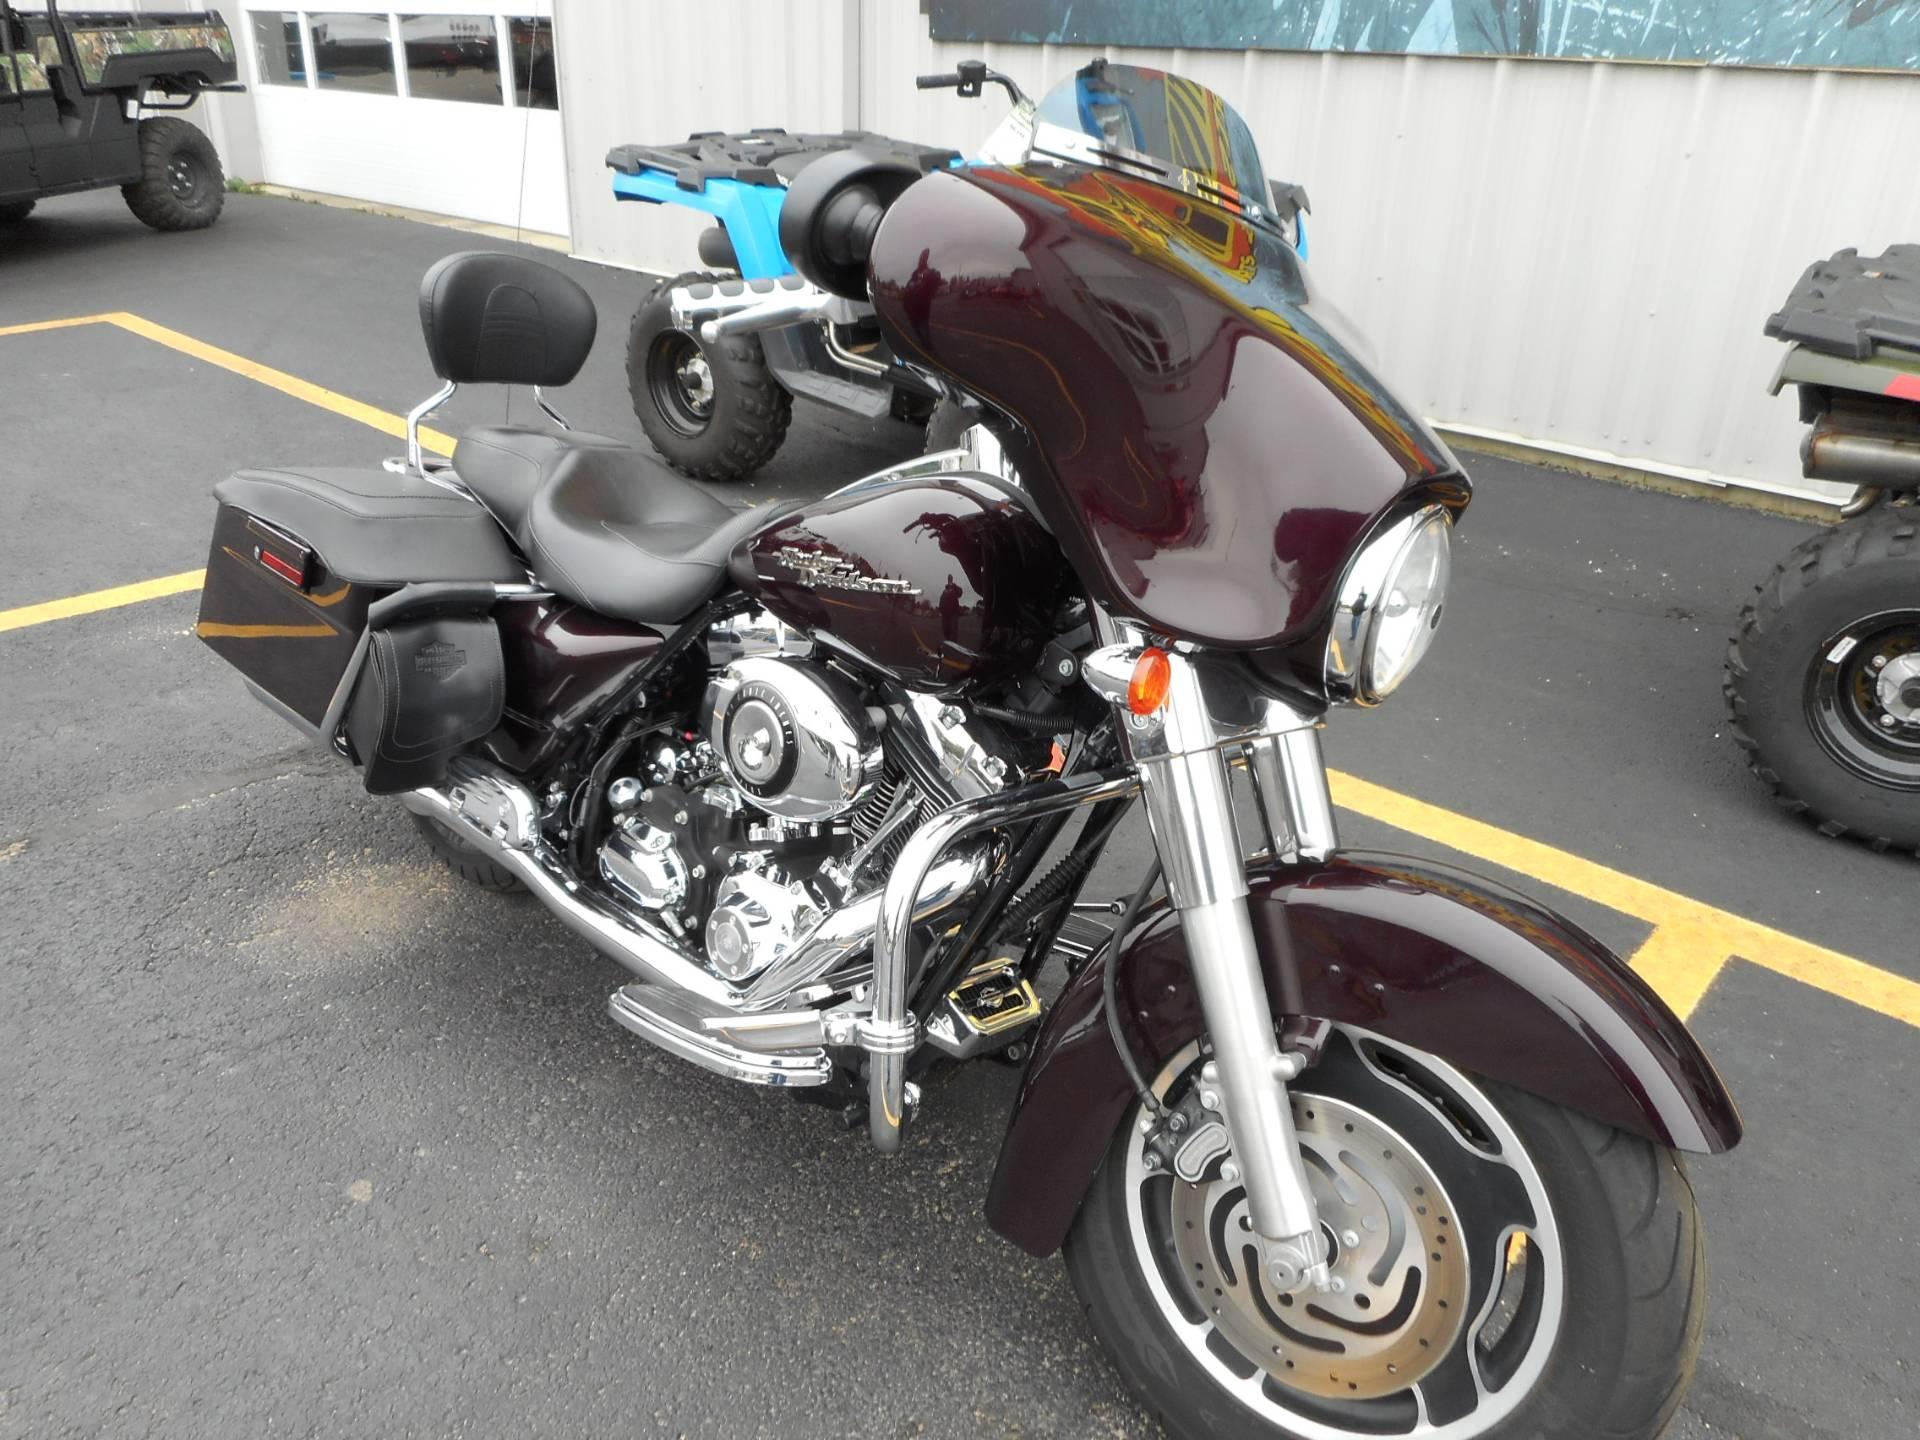 2007 Harley-Davidson FLHX Street Glide 1